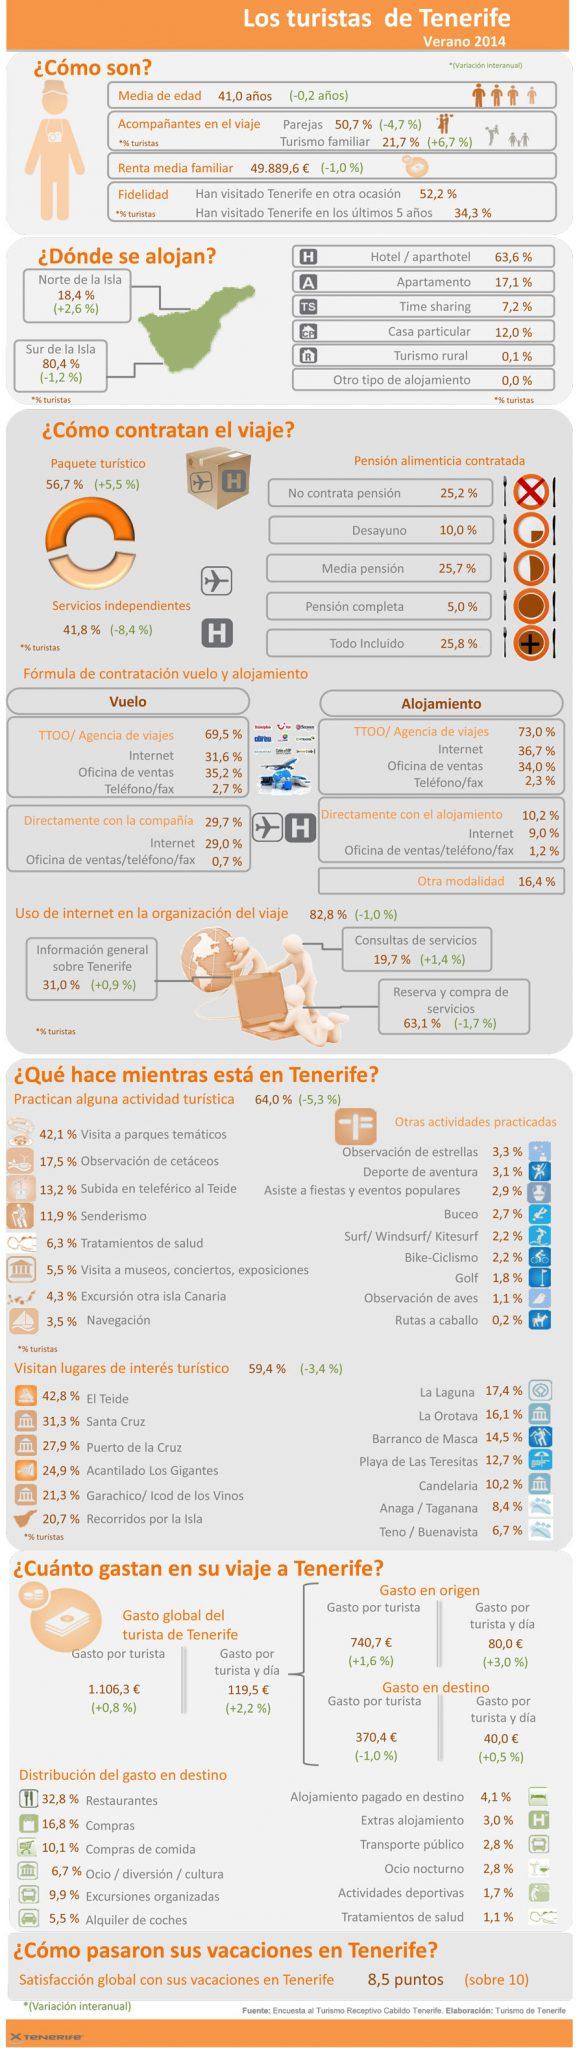 infografia-encuesta-verano